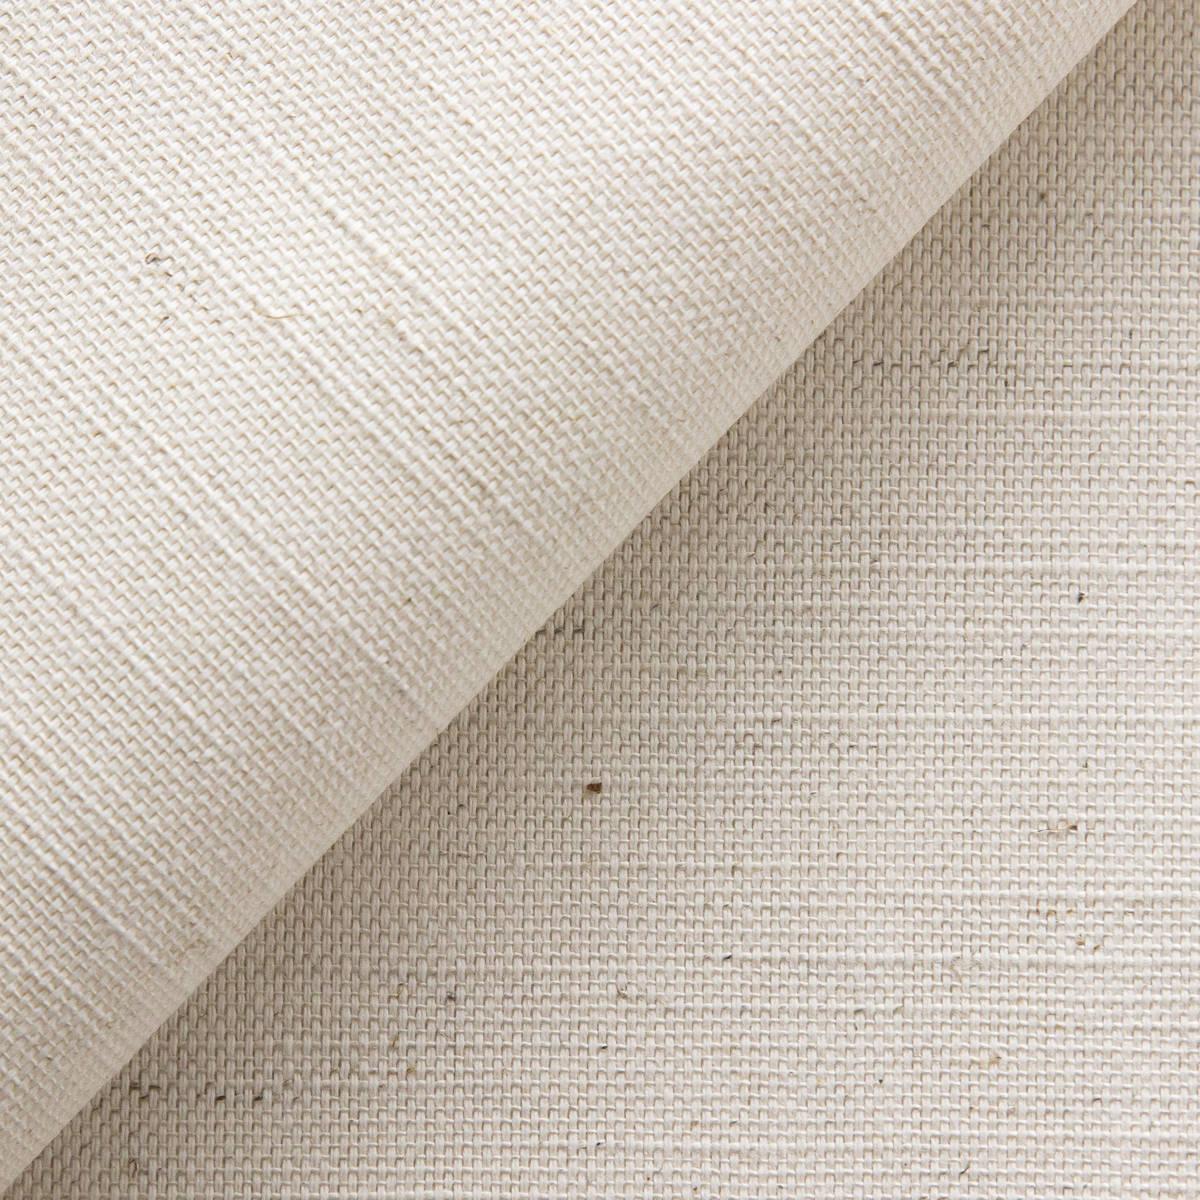 Natural Luxury Linen 228gsm